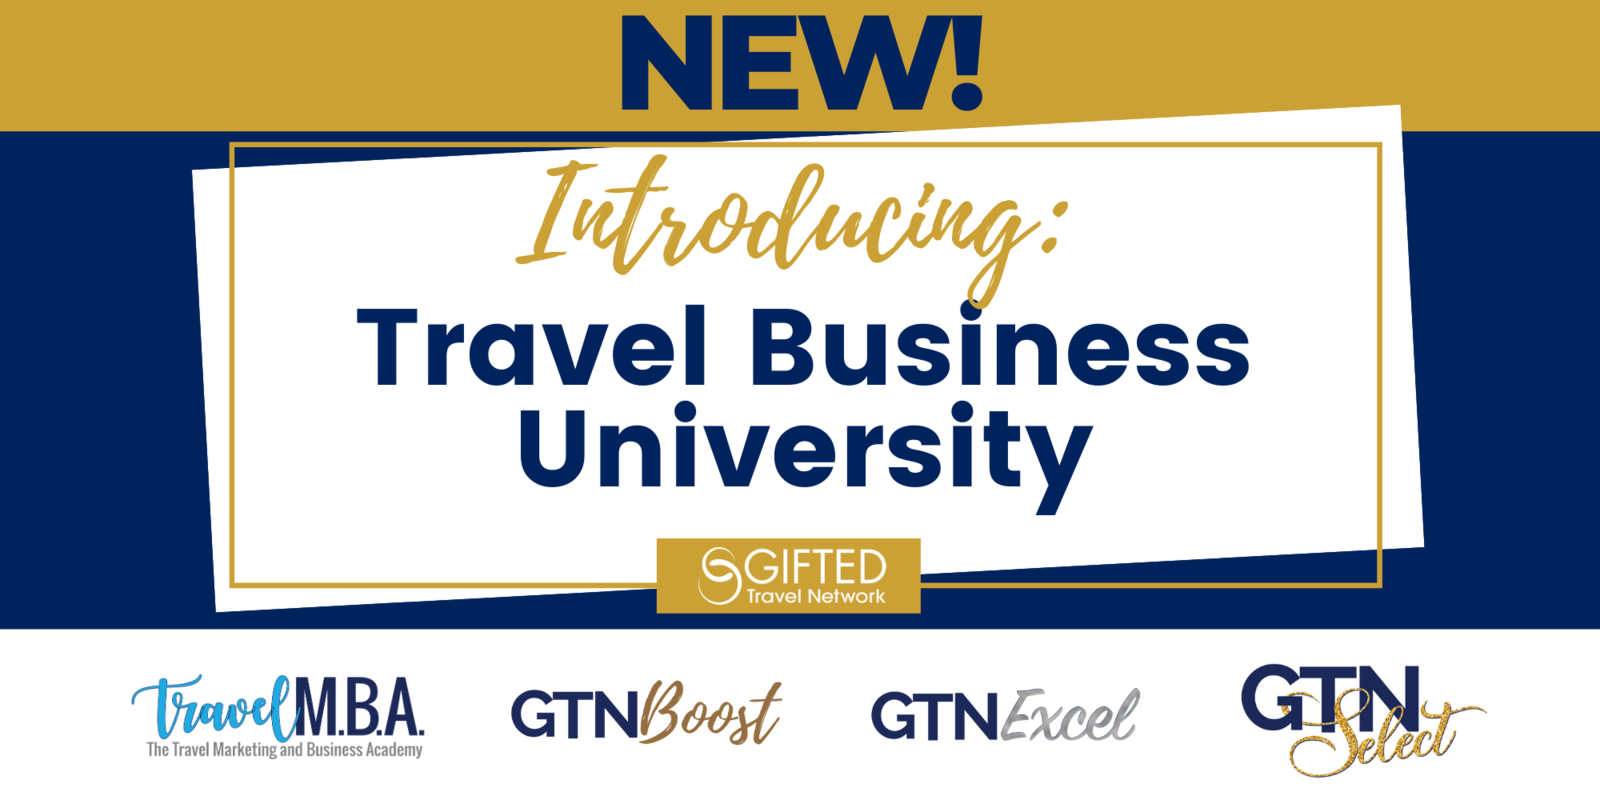 Travel Business University